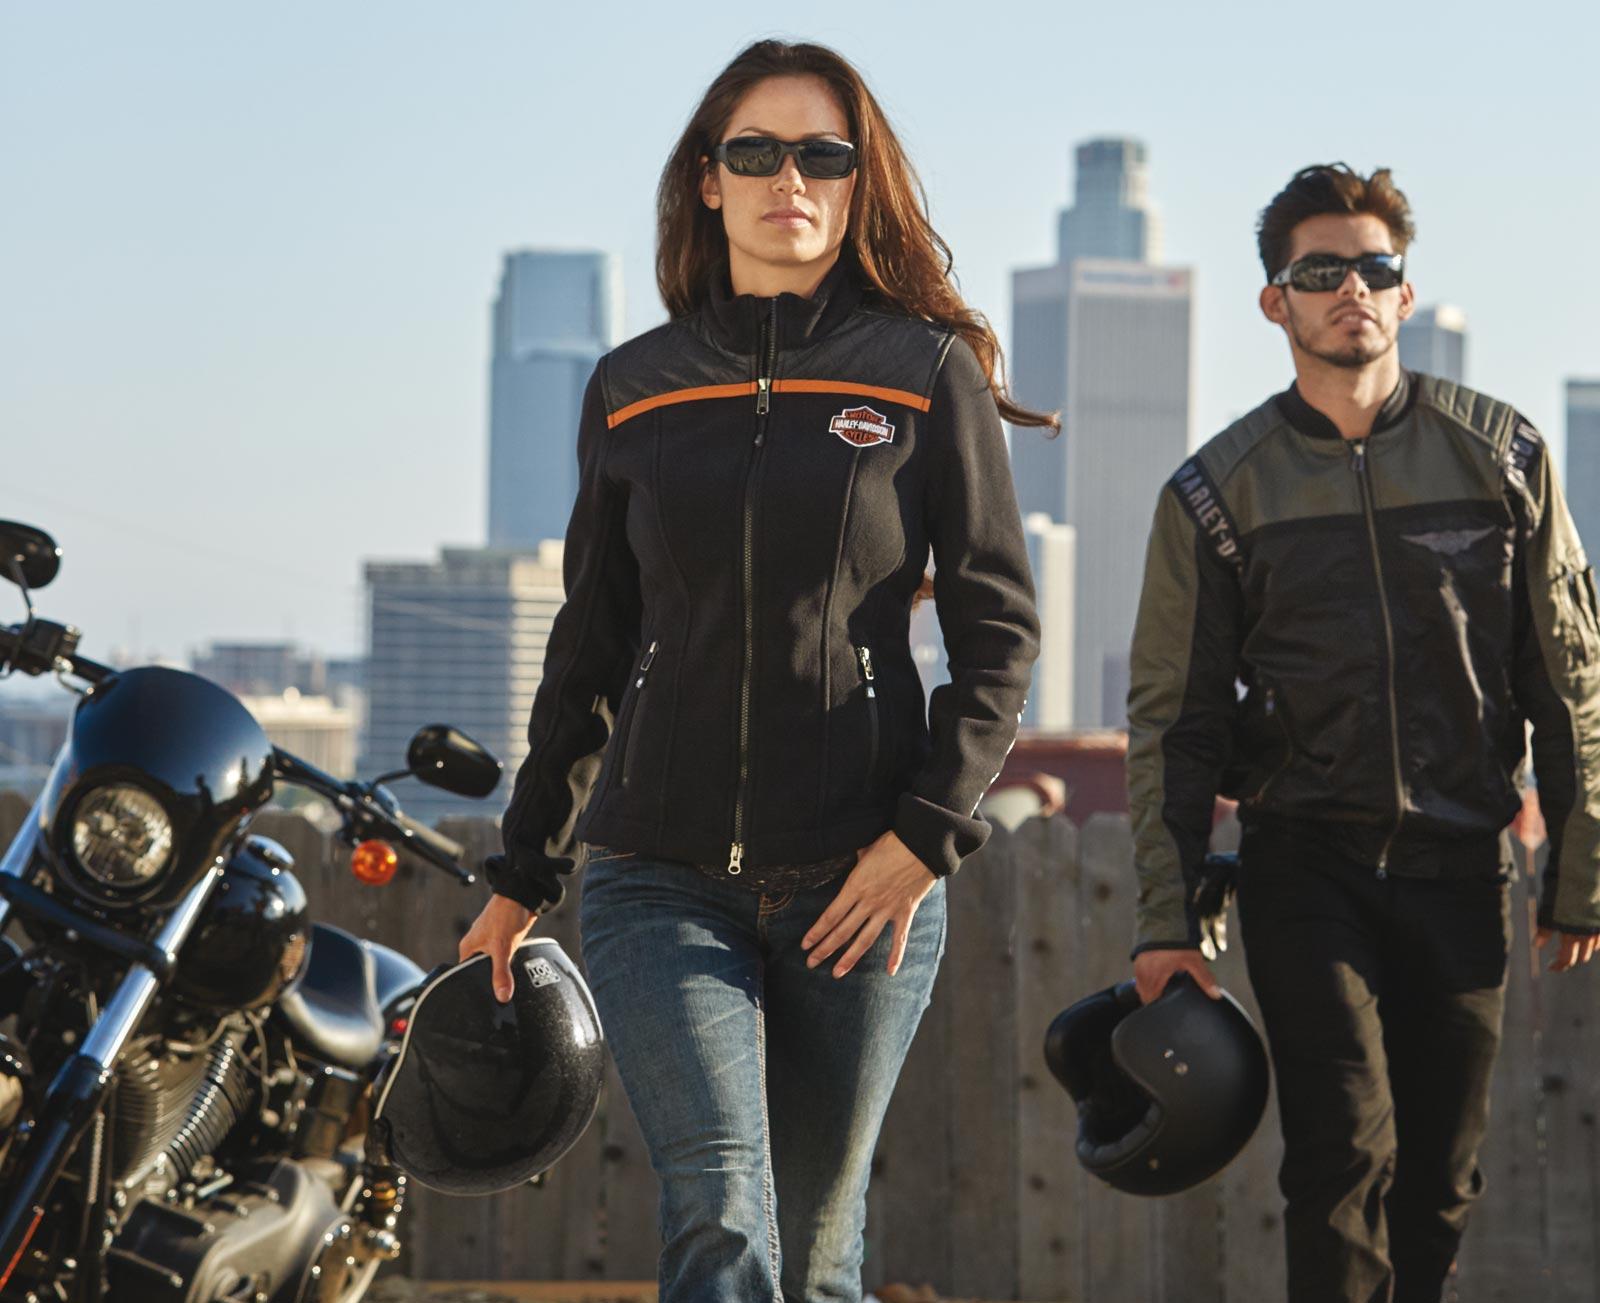 Fleece Davidson Enthusiast Jacket Miss Harley zSpqMVU